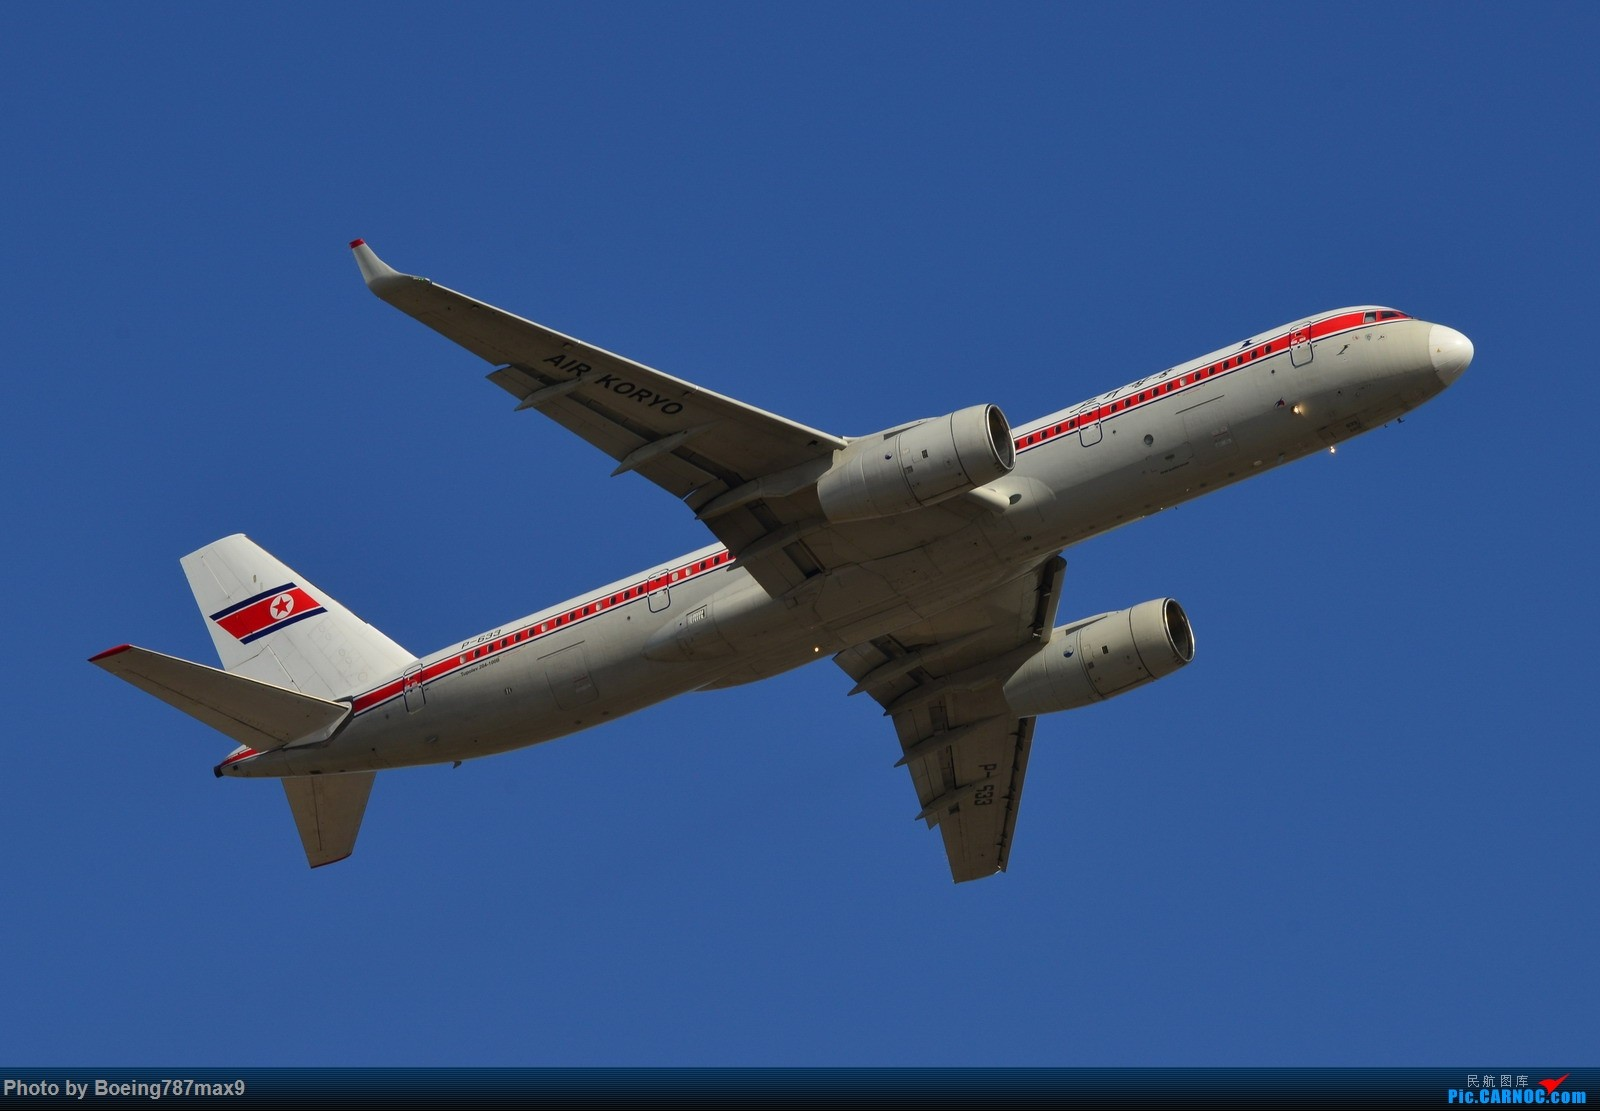 Re:【PEK】今日东停车场蹲点,好货一堆。KLM744、DELTA763、国航星空332、国航748、最重要的是朝鲜的图204、还有国航中法50年77W、汉莎346 TUPOLEV TU-204-100B P-633 中国北京首都国际机场